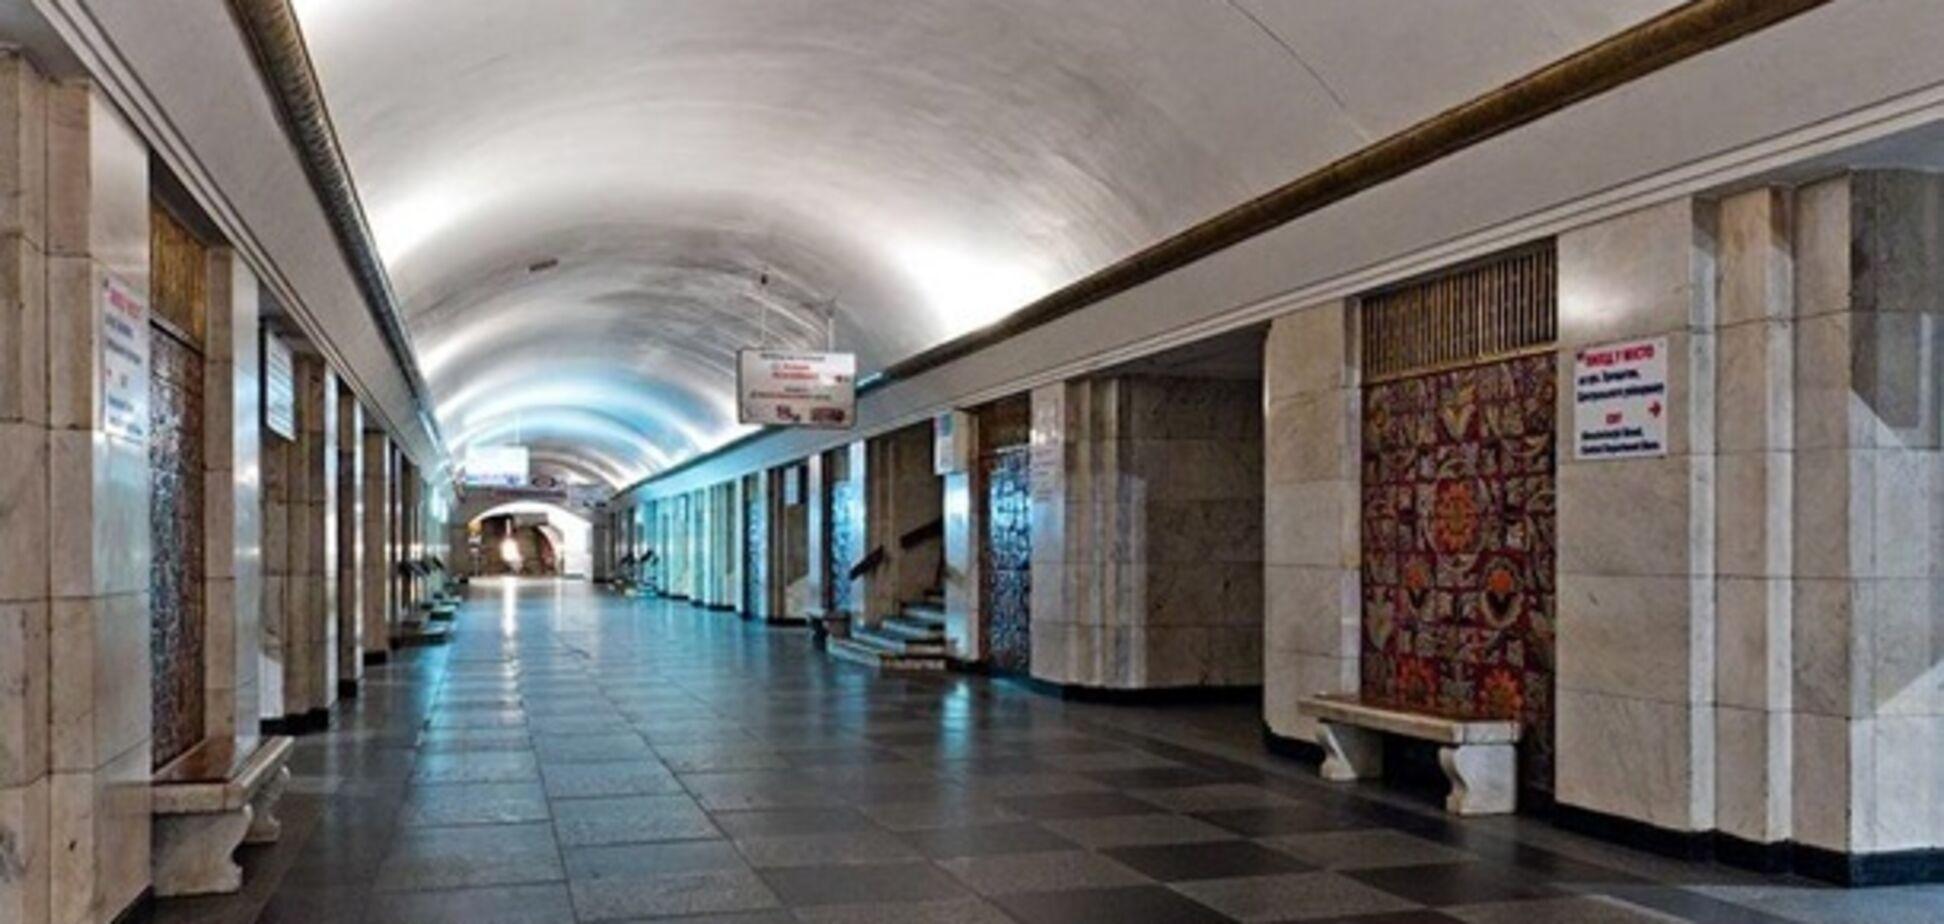 Из-за 'минирования' закрыта станция Крещатик